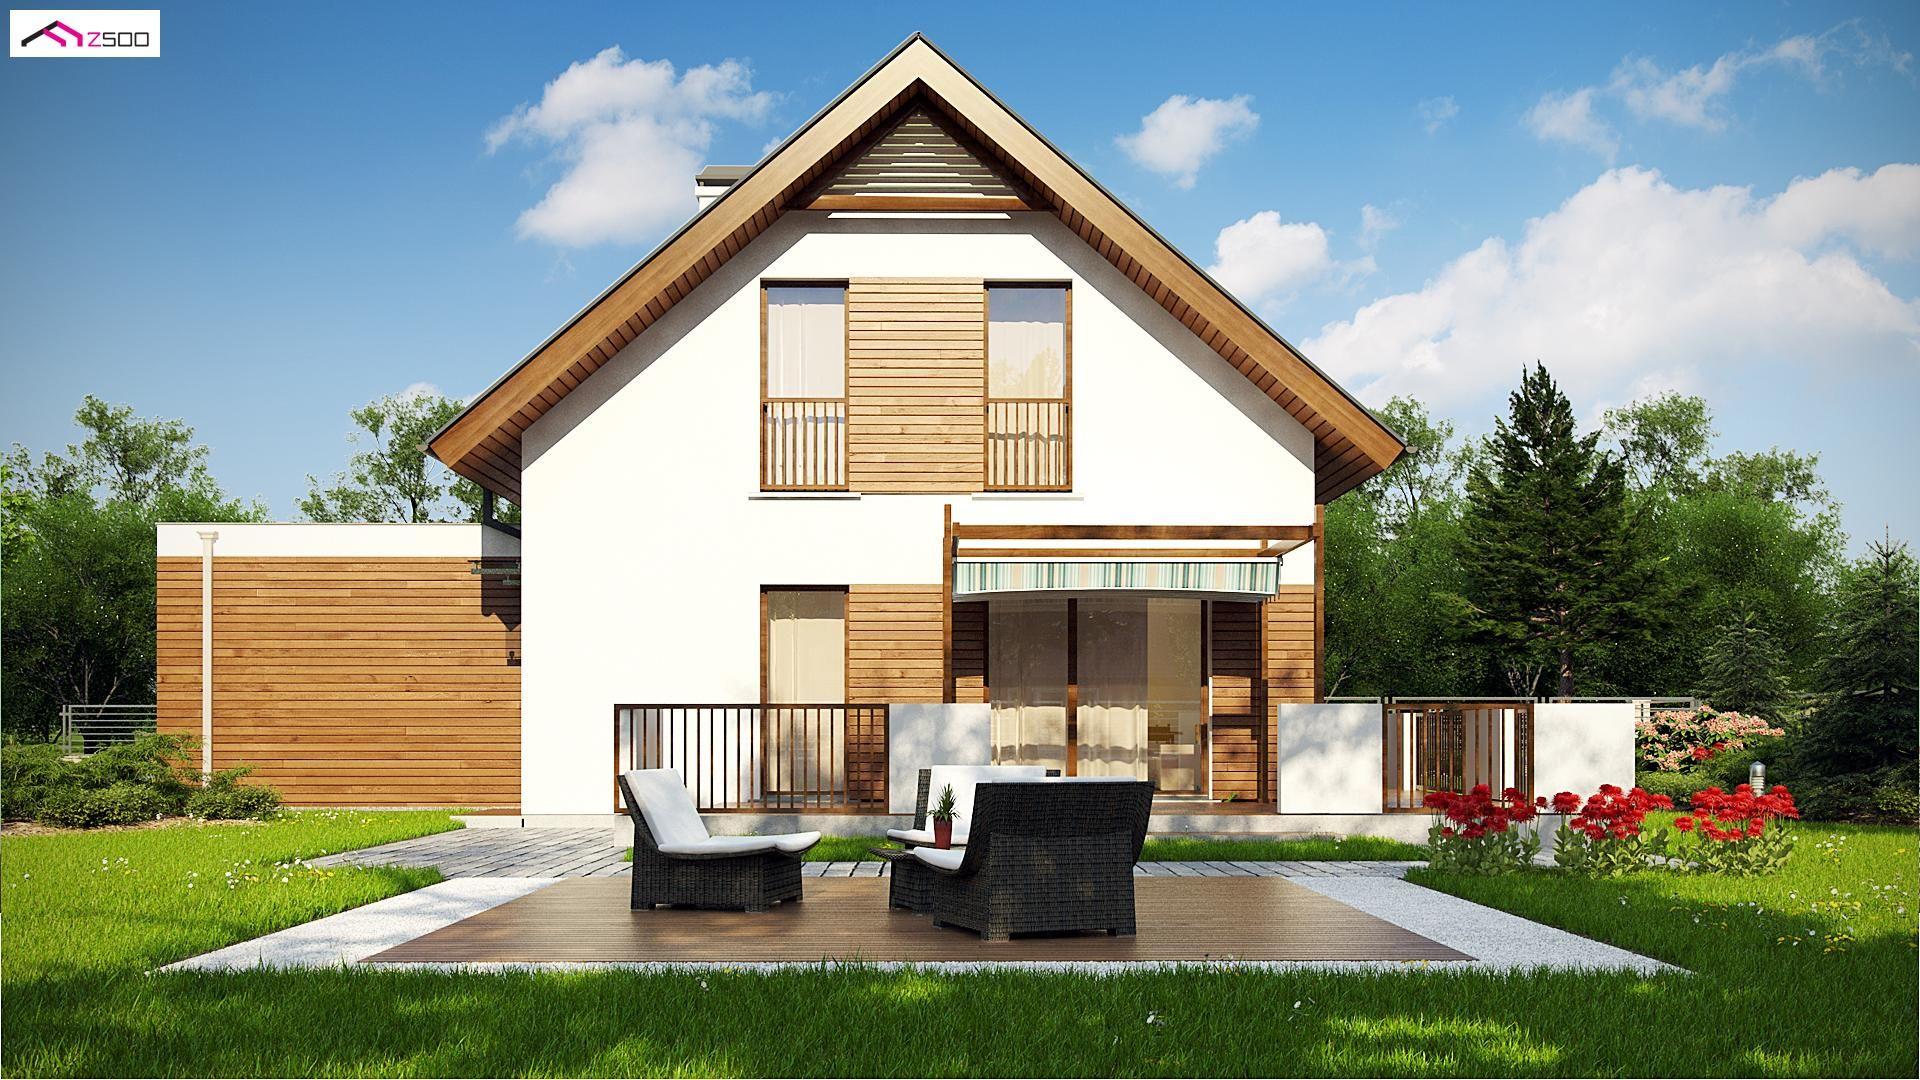 Techwood House Z500 Casas Prefabricadas Casas Pinterest